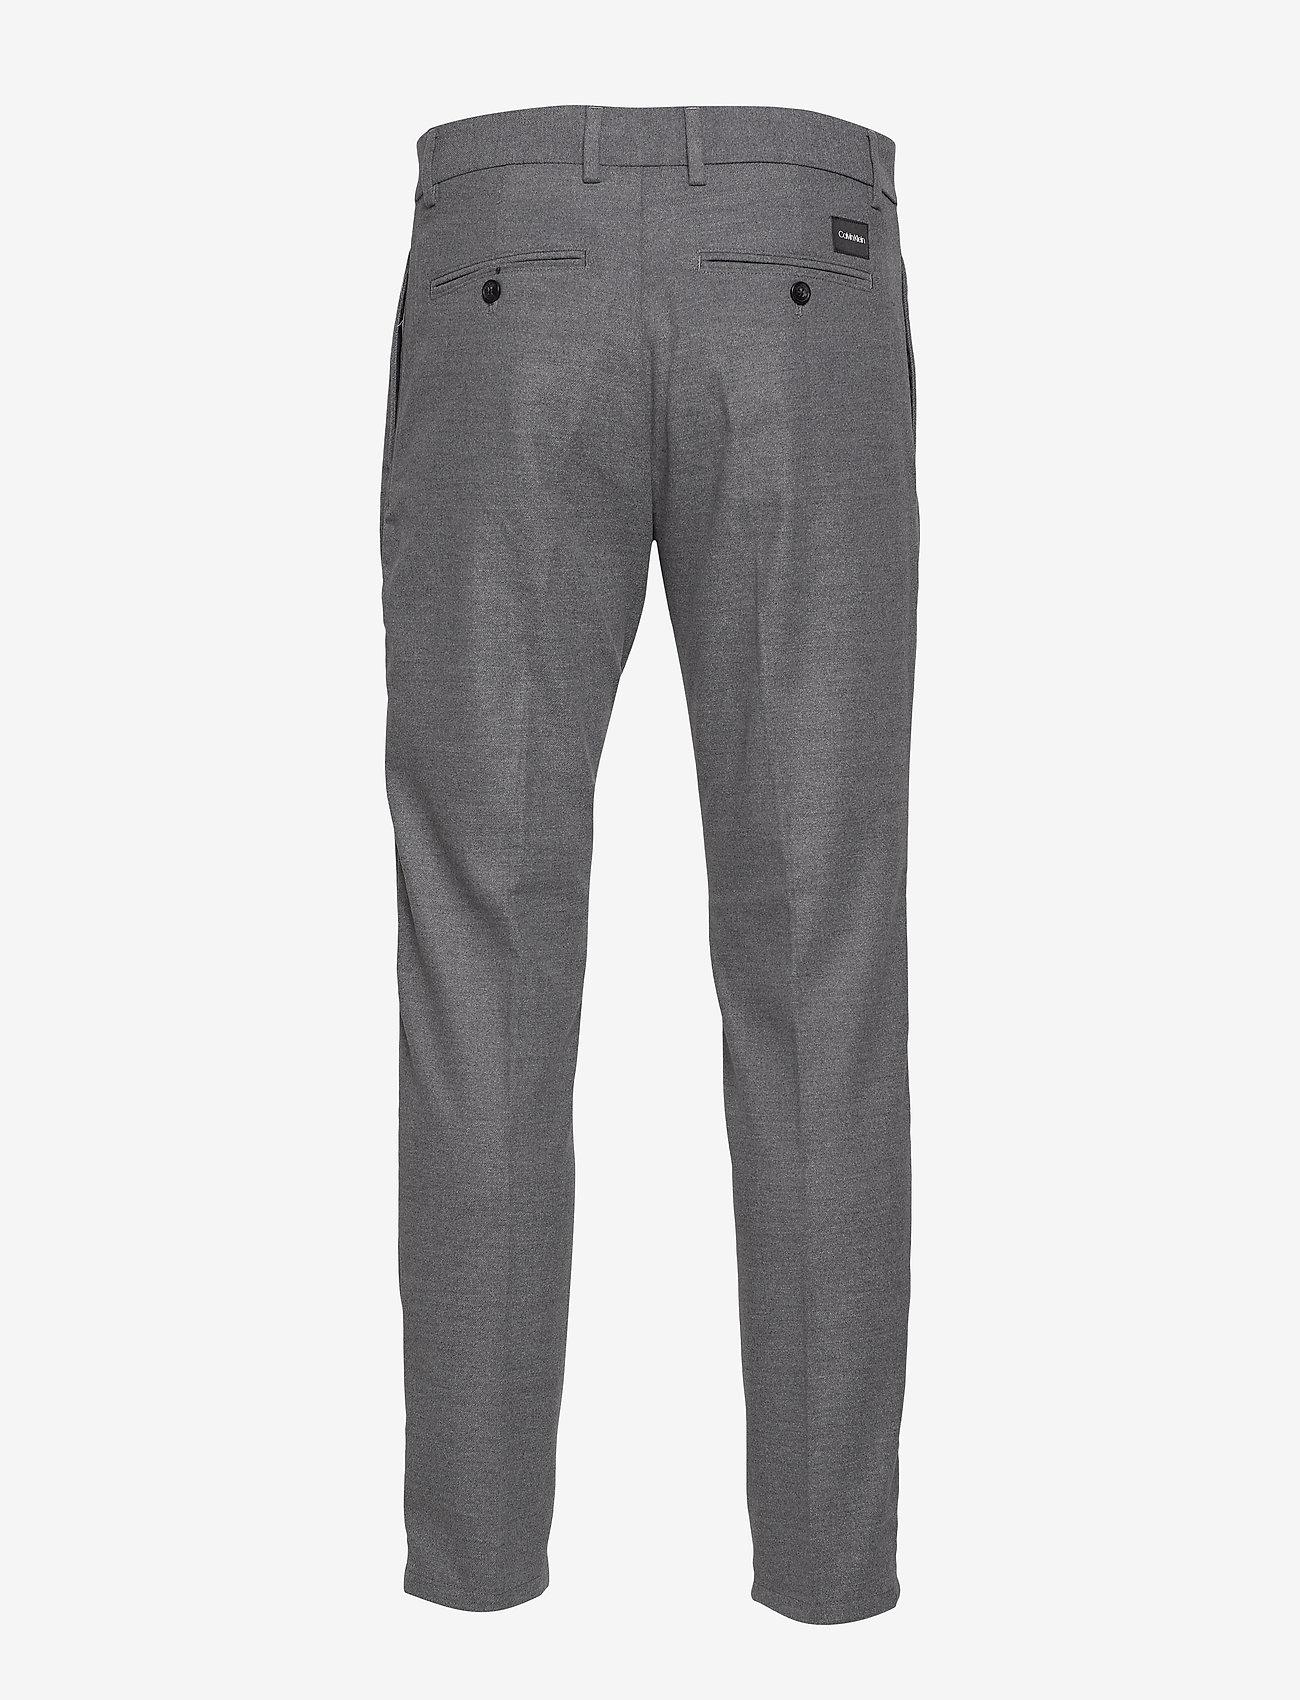 Tapered Pleat Melange Twill Pant (Medium Charcoal) - Calvin Klein etvcT1